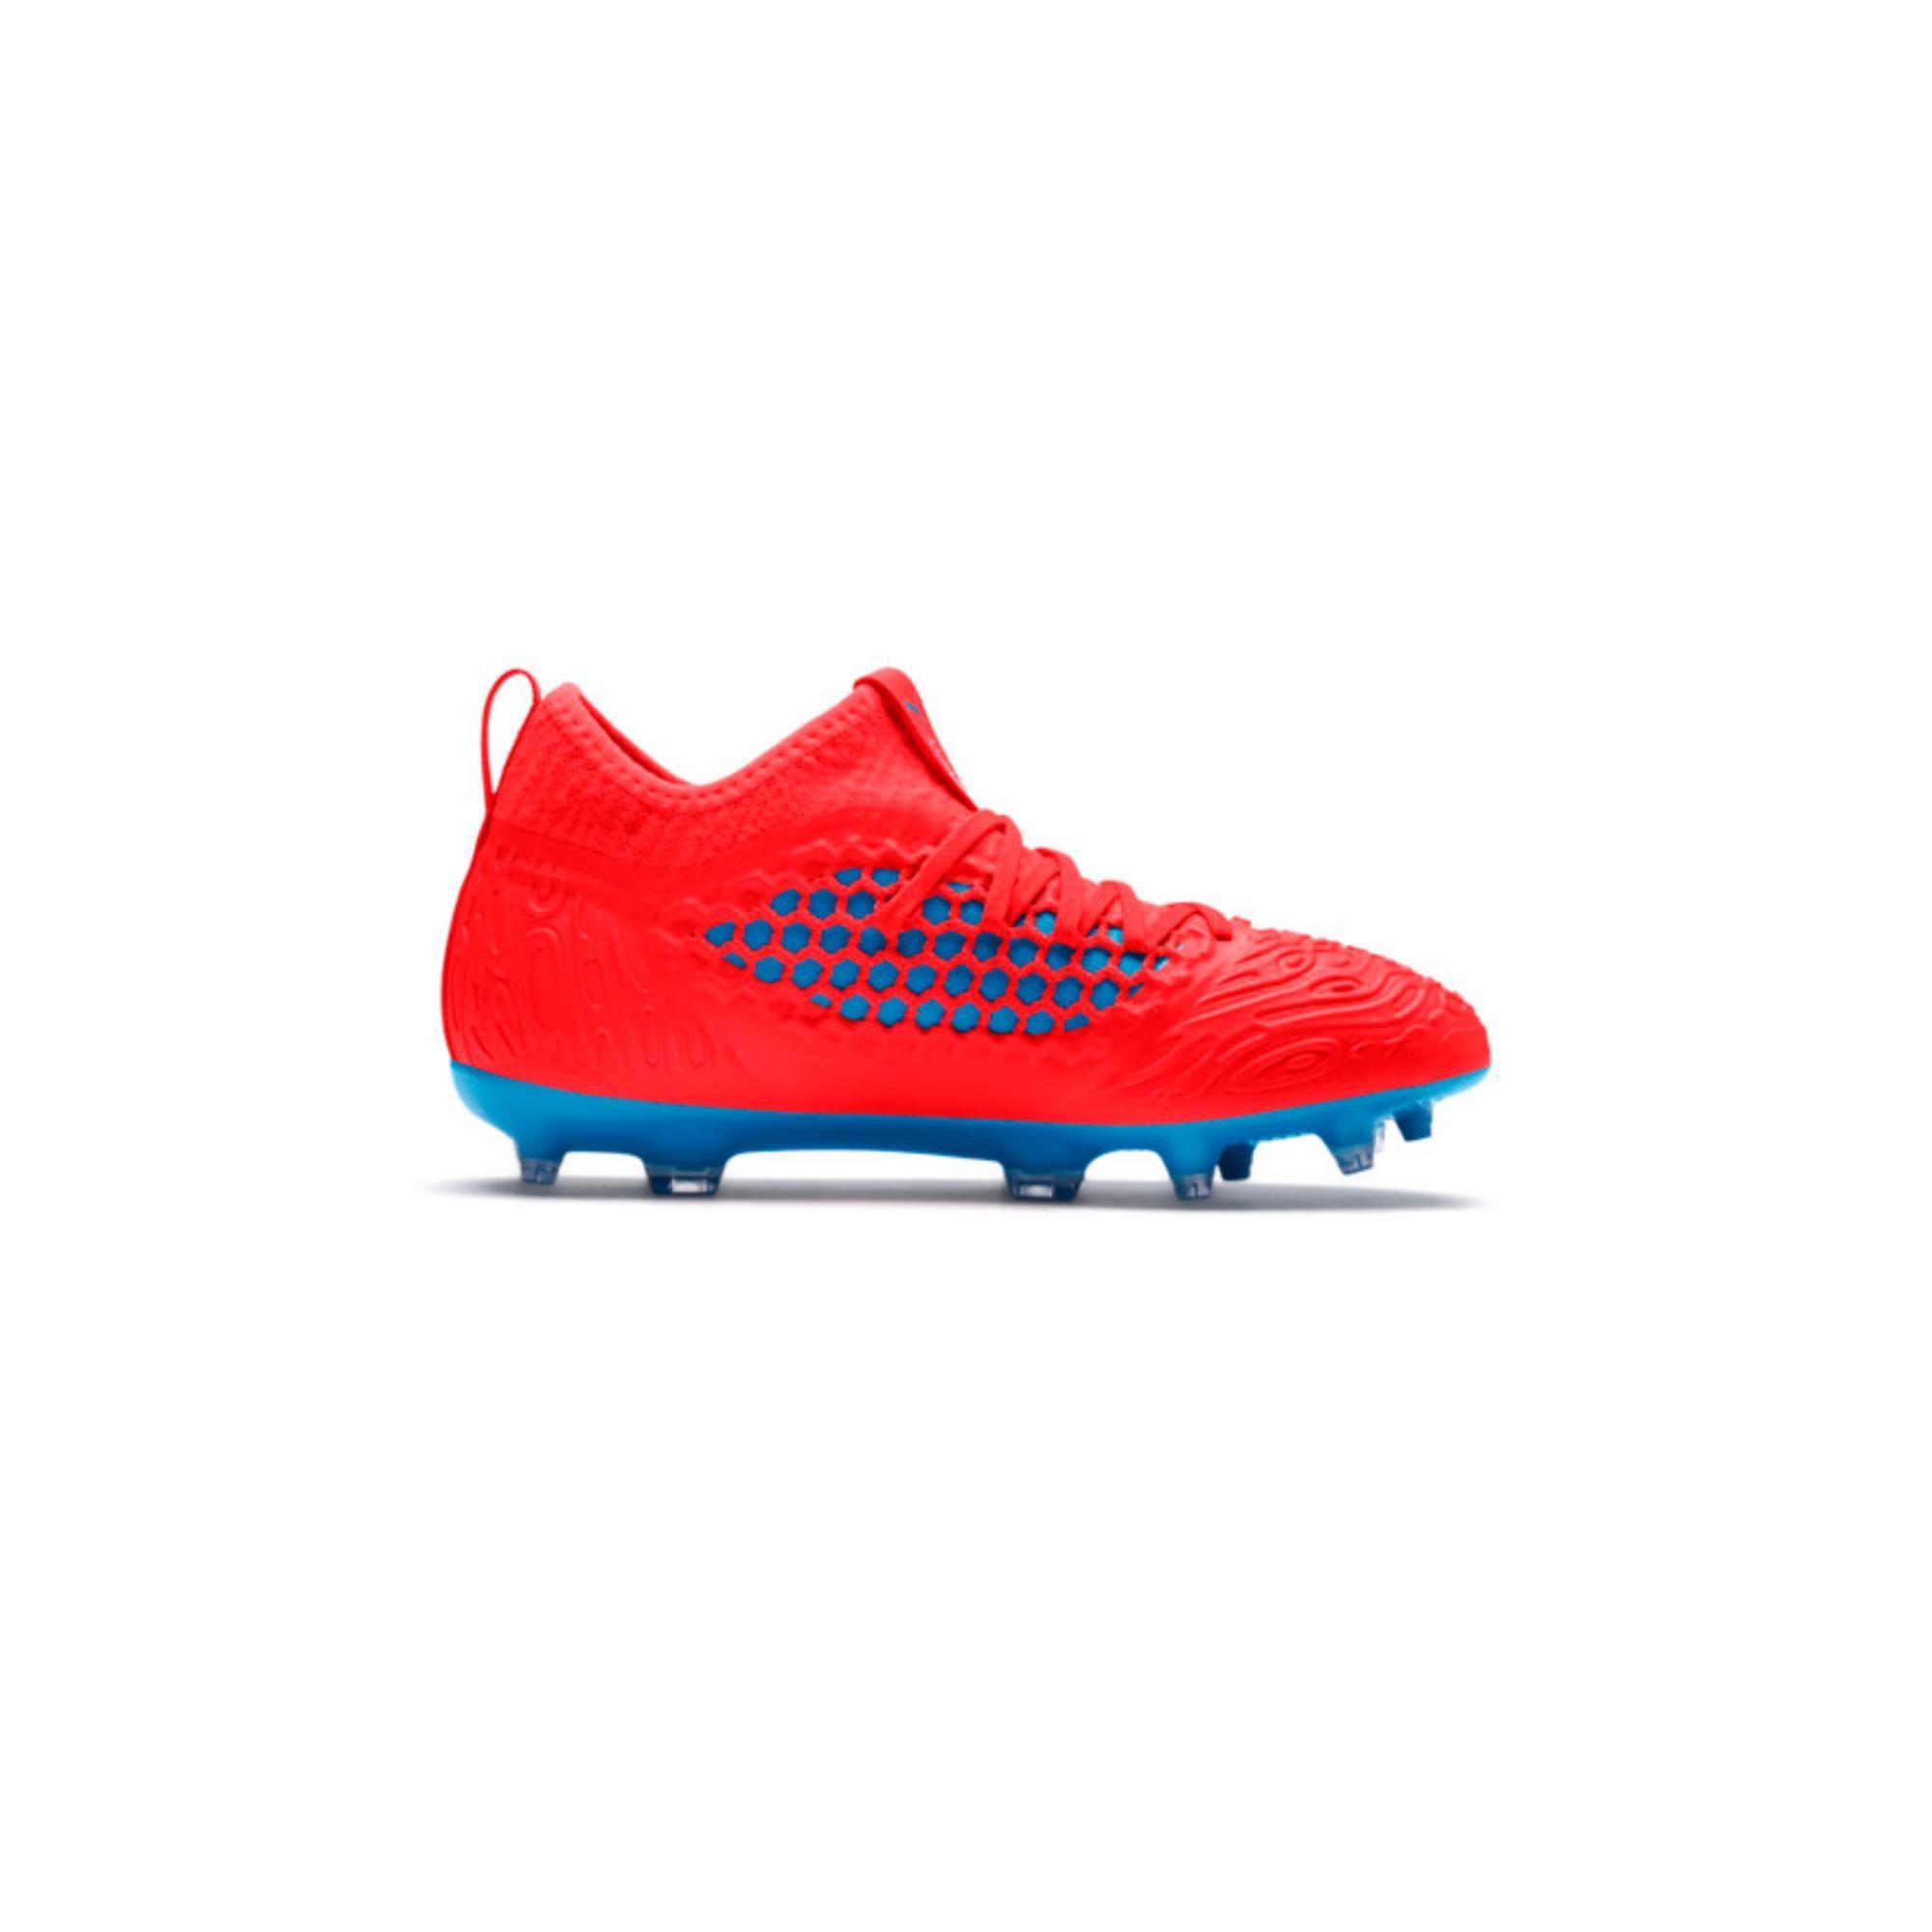 Puma Voetbalschoenen kind Future 19 3 FG rood